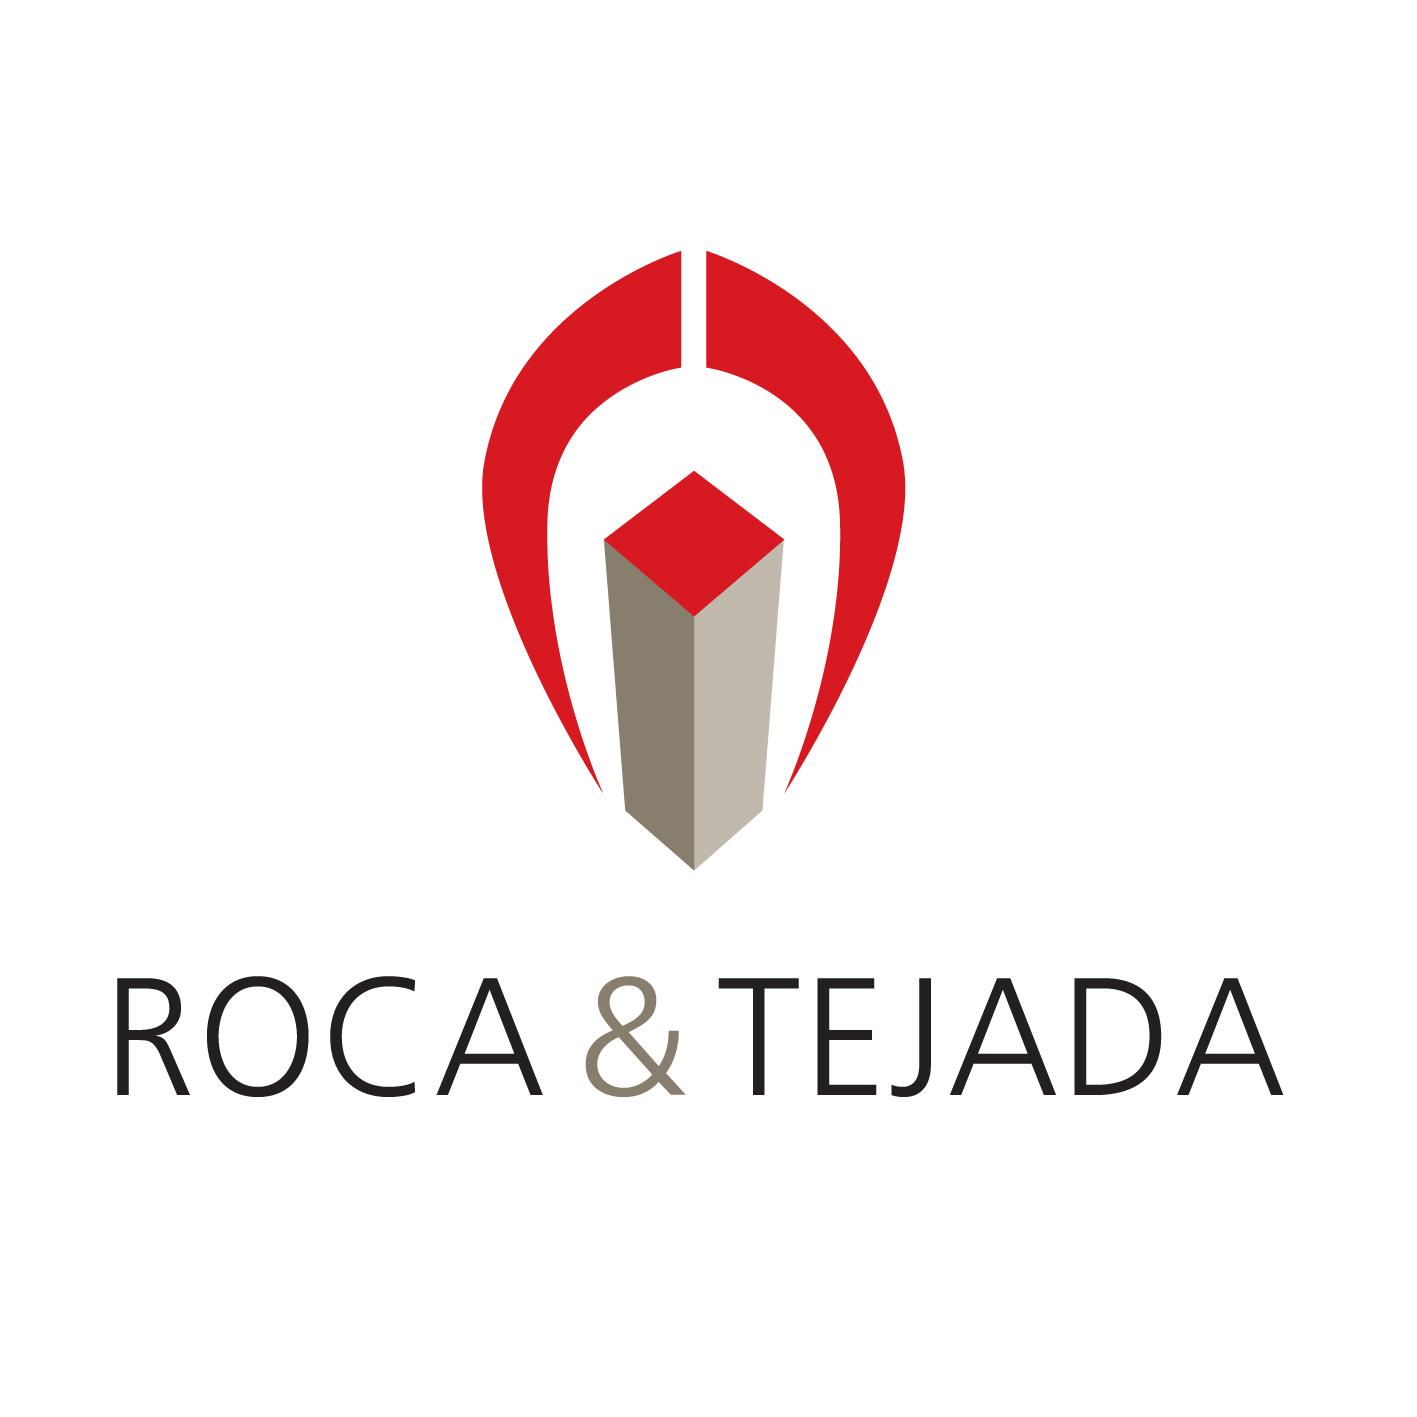 Administradores De Fincas Roca & Tejada